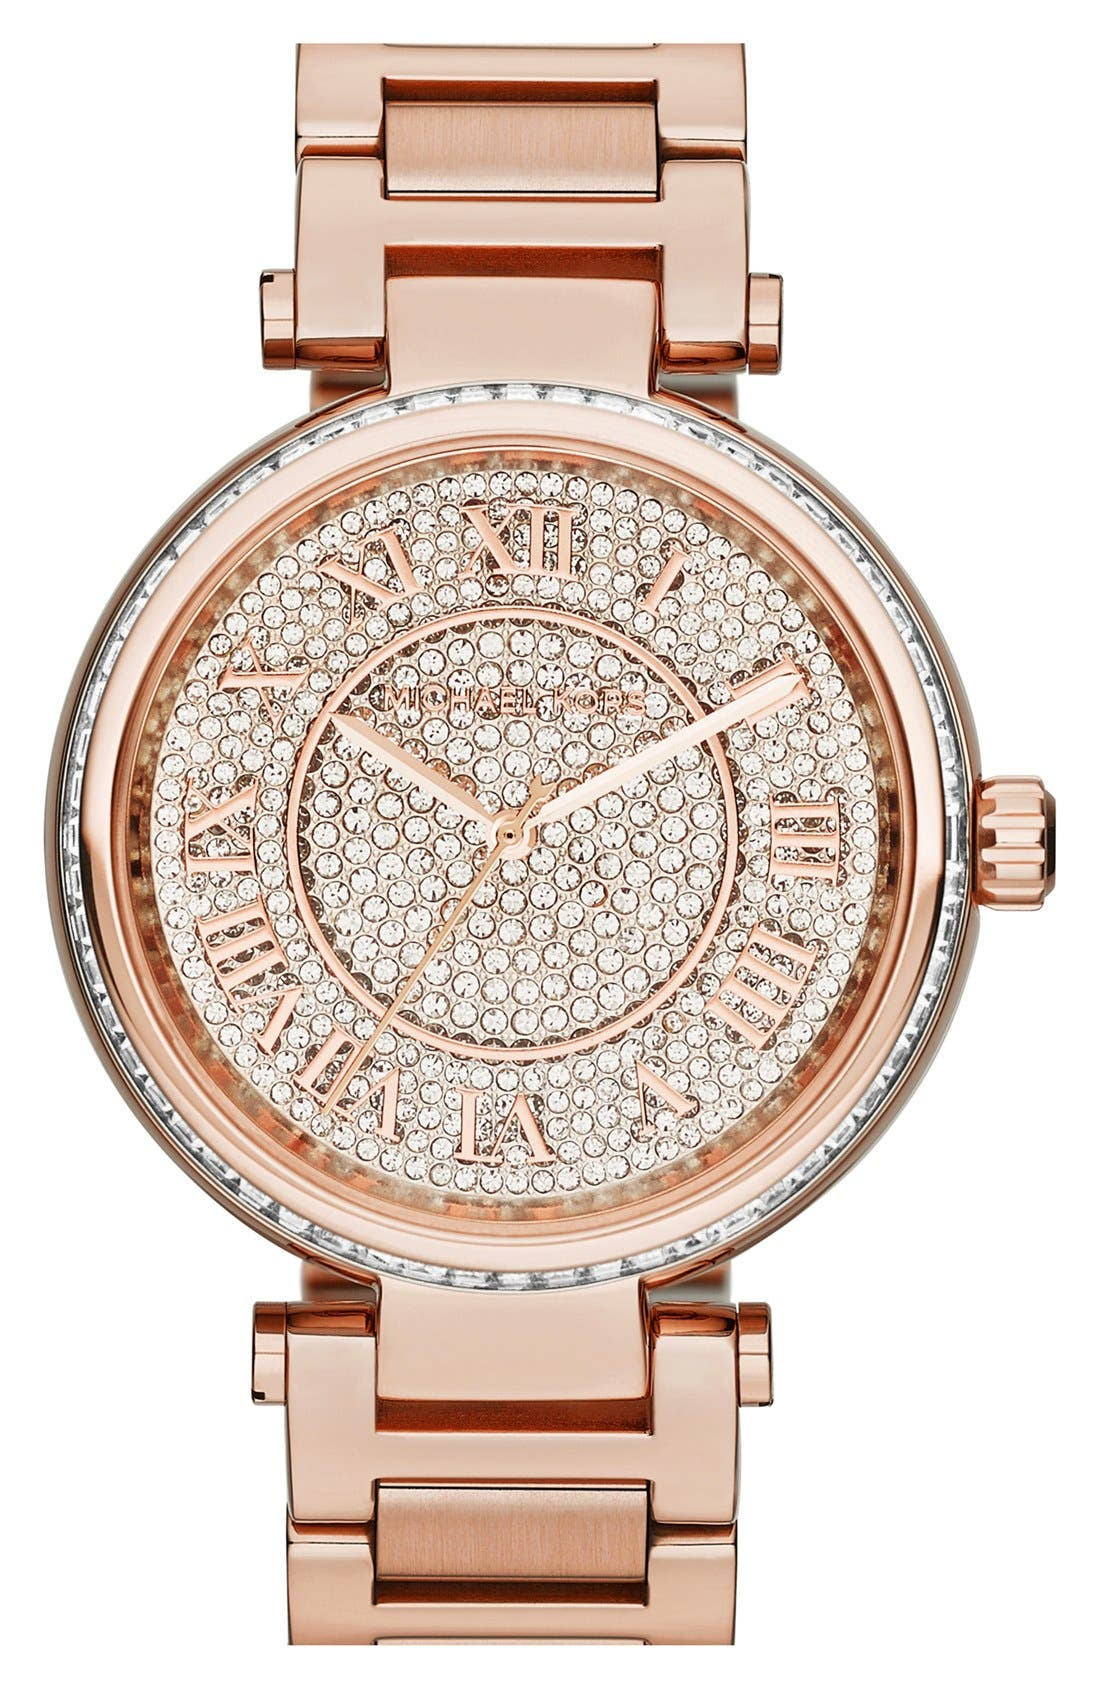 Main Image - Michael Kors 'Skylar' Pavé Dial Bracelet Watch, 42mm